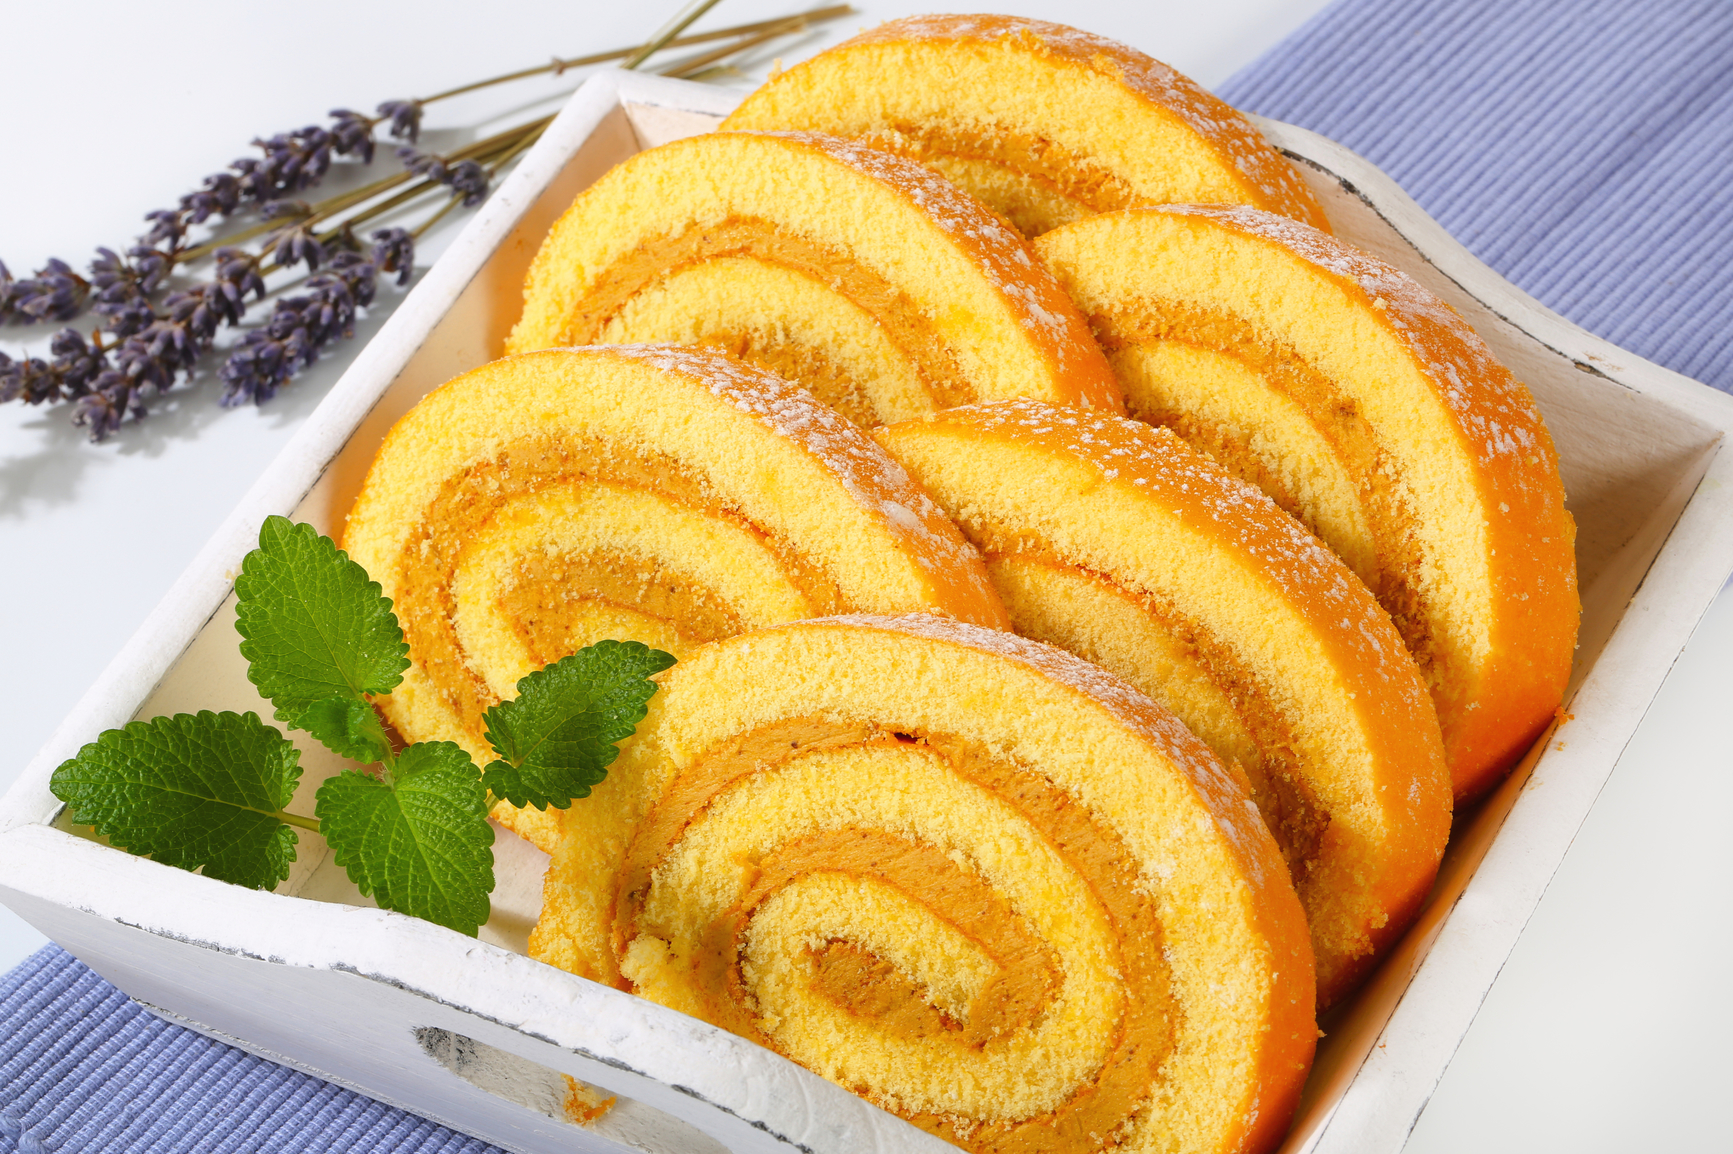 рецепт бисквитно яблочного рулета со сбитыми сливками